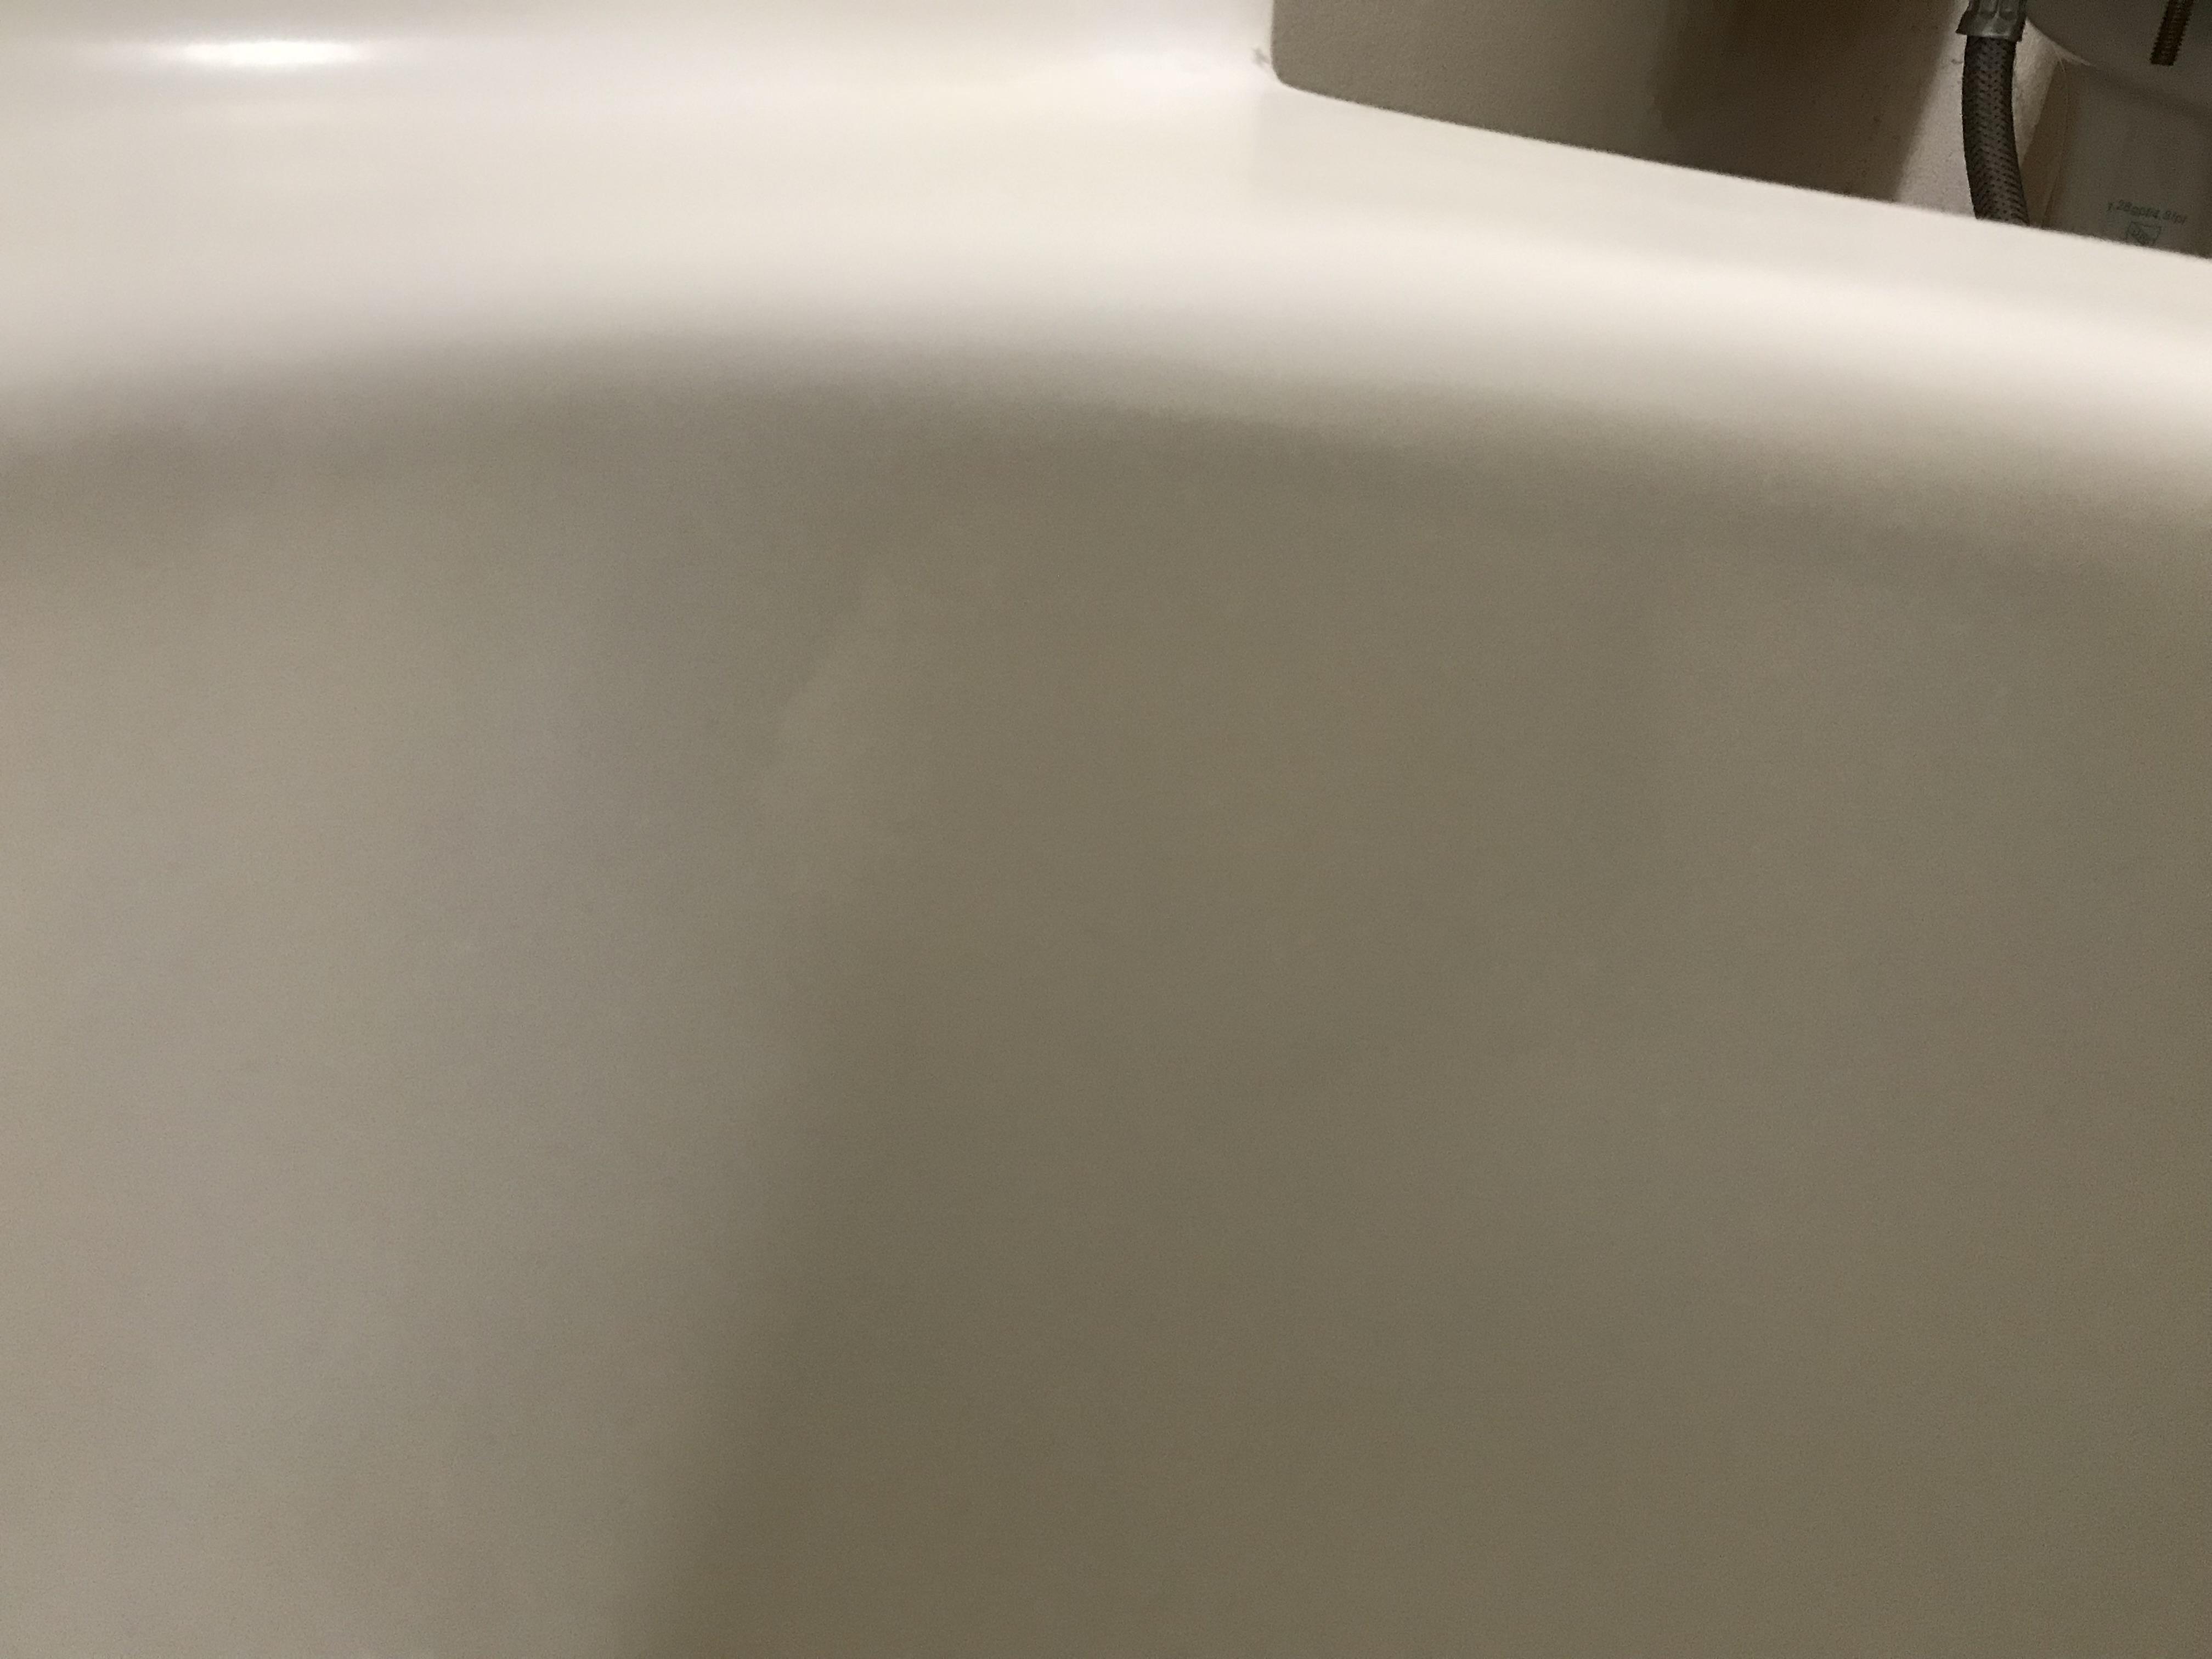 Bathtub Refinishing After Repair - NuFinishPro